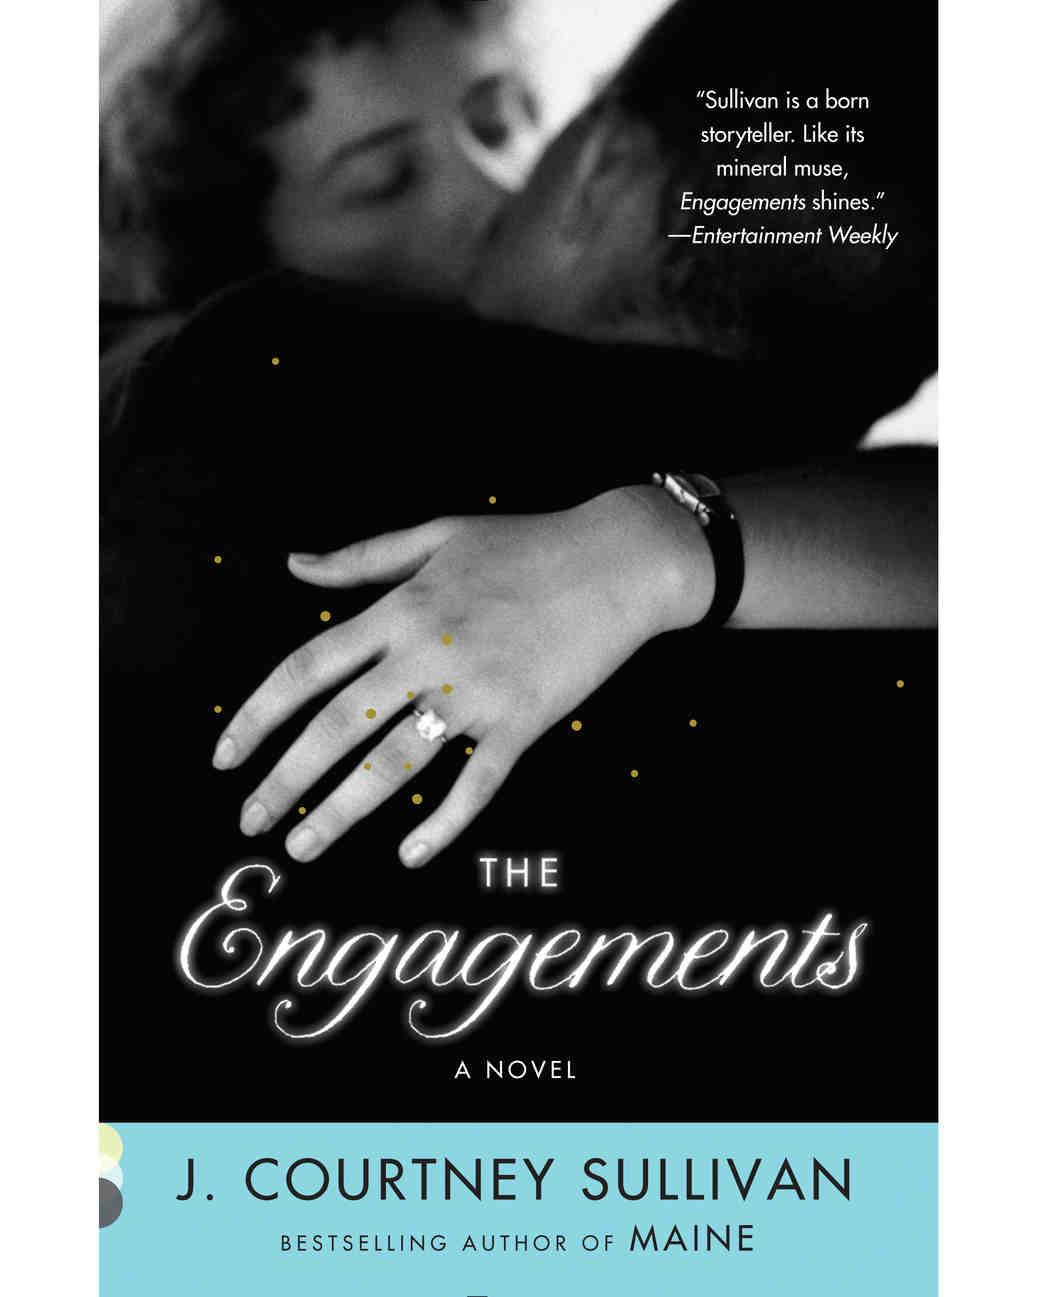 romantic-beach-reads-engagements-0715.jpg